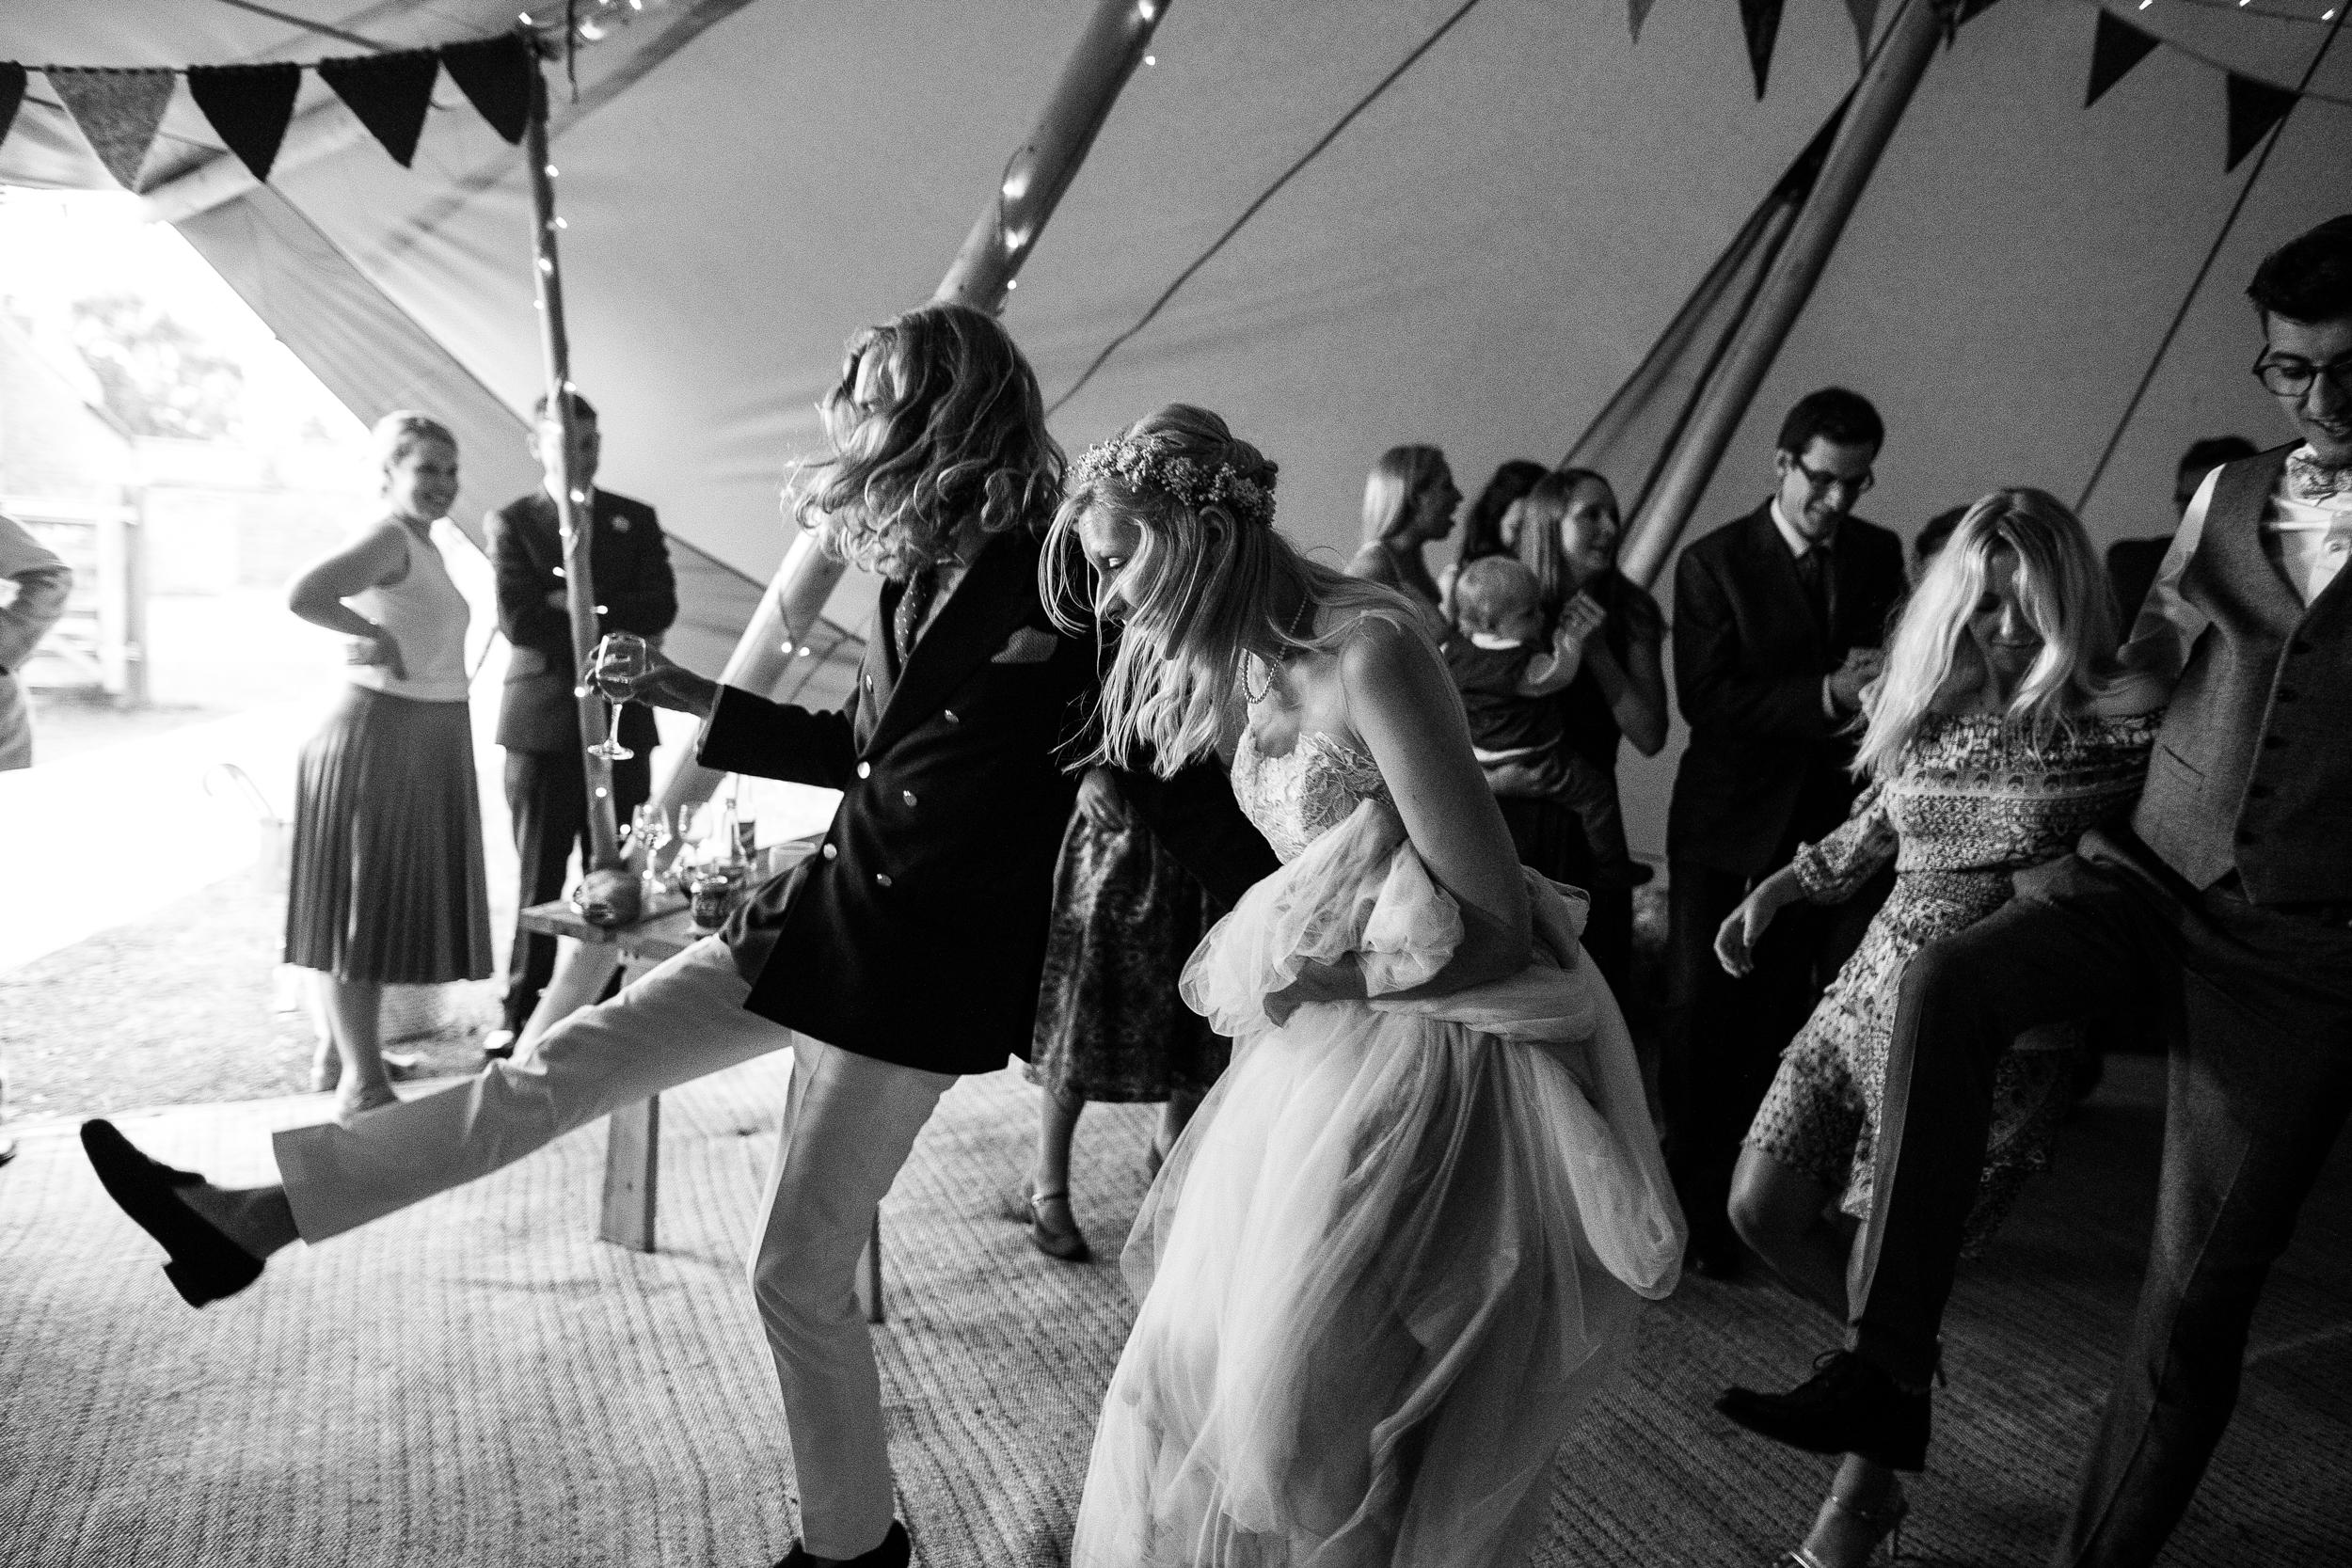 creative-wedding-photography-teesside-north-east-yorkshire-26.jpg